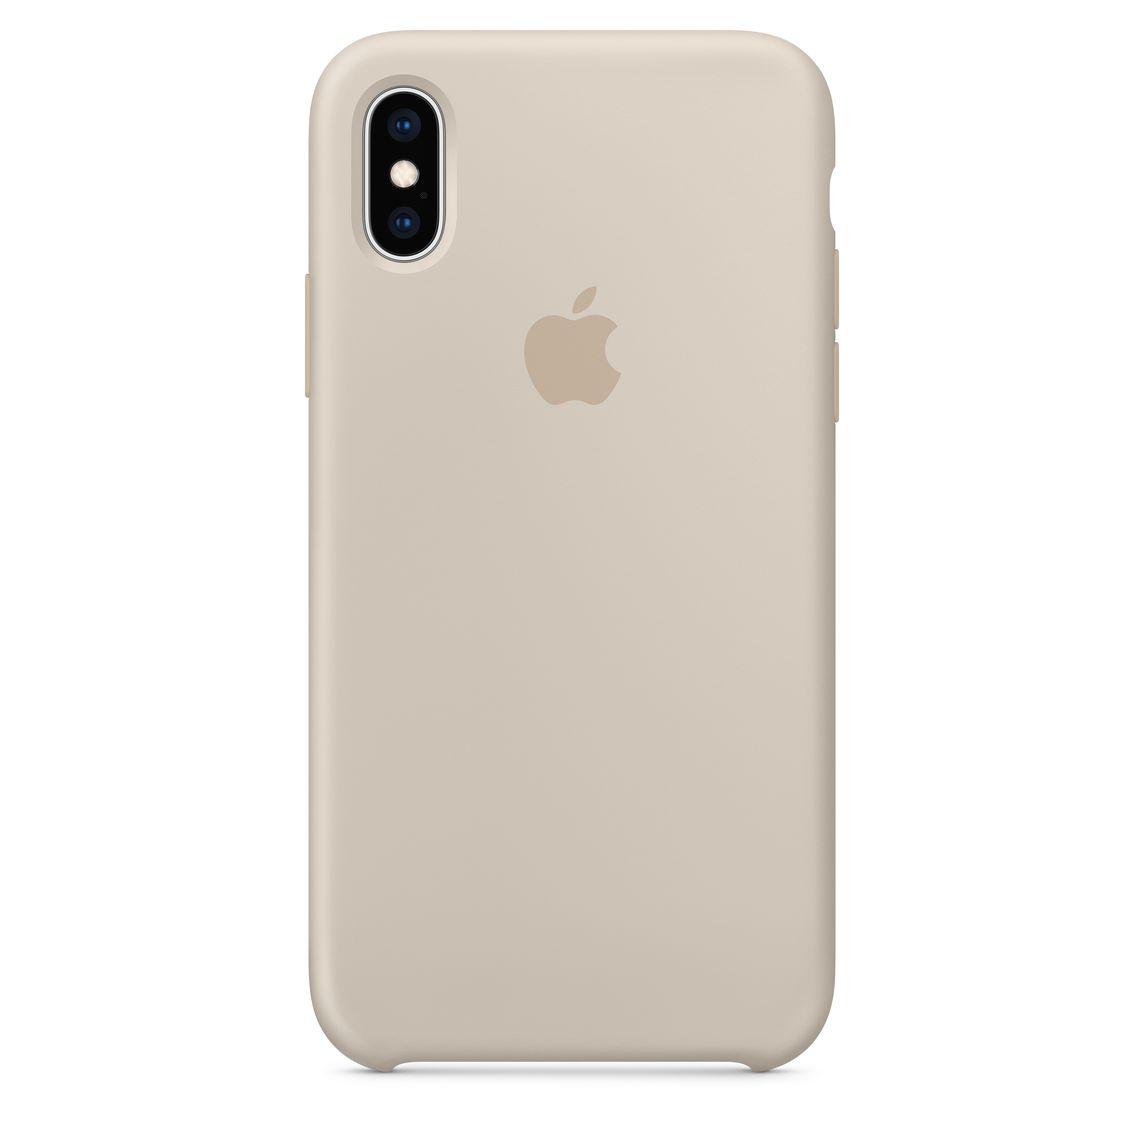 buy online c893c 4ac81 iPhone XS Silicone Case - Stone